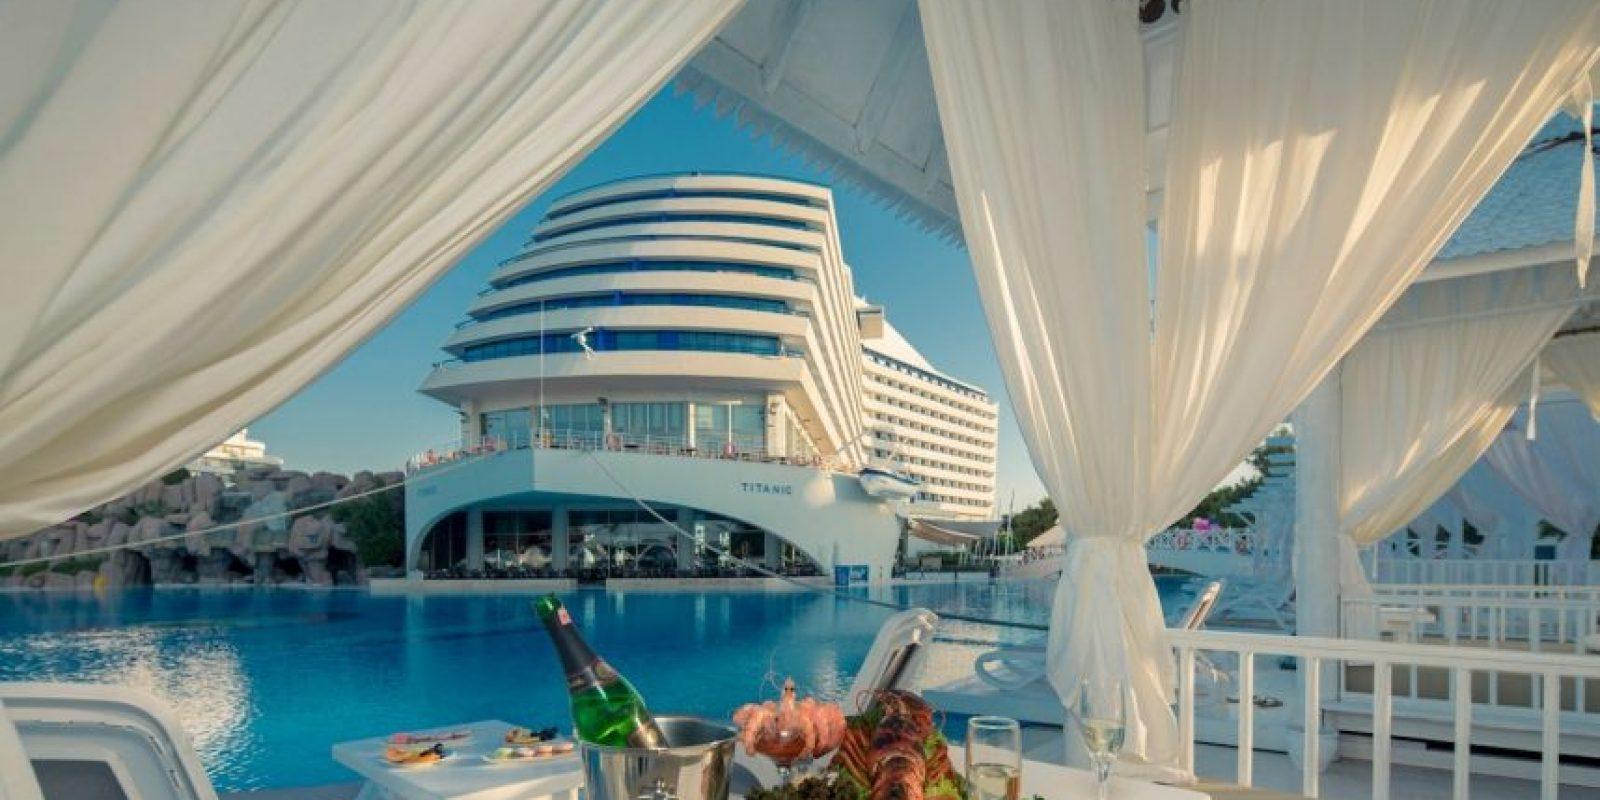 """Titanic Beach Lara"" es el nombre del hotel turco que ha recreado el aspecto del crucero que se hundió en 1912. Foto:The Grosby Group"